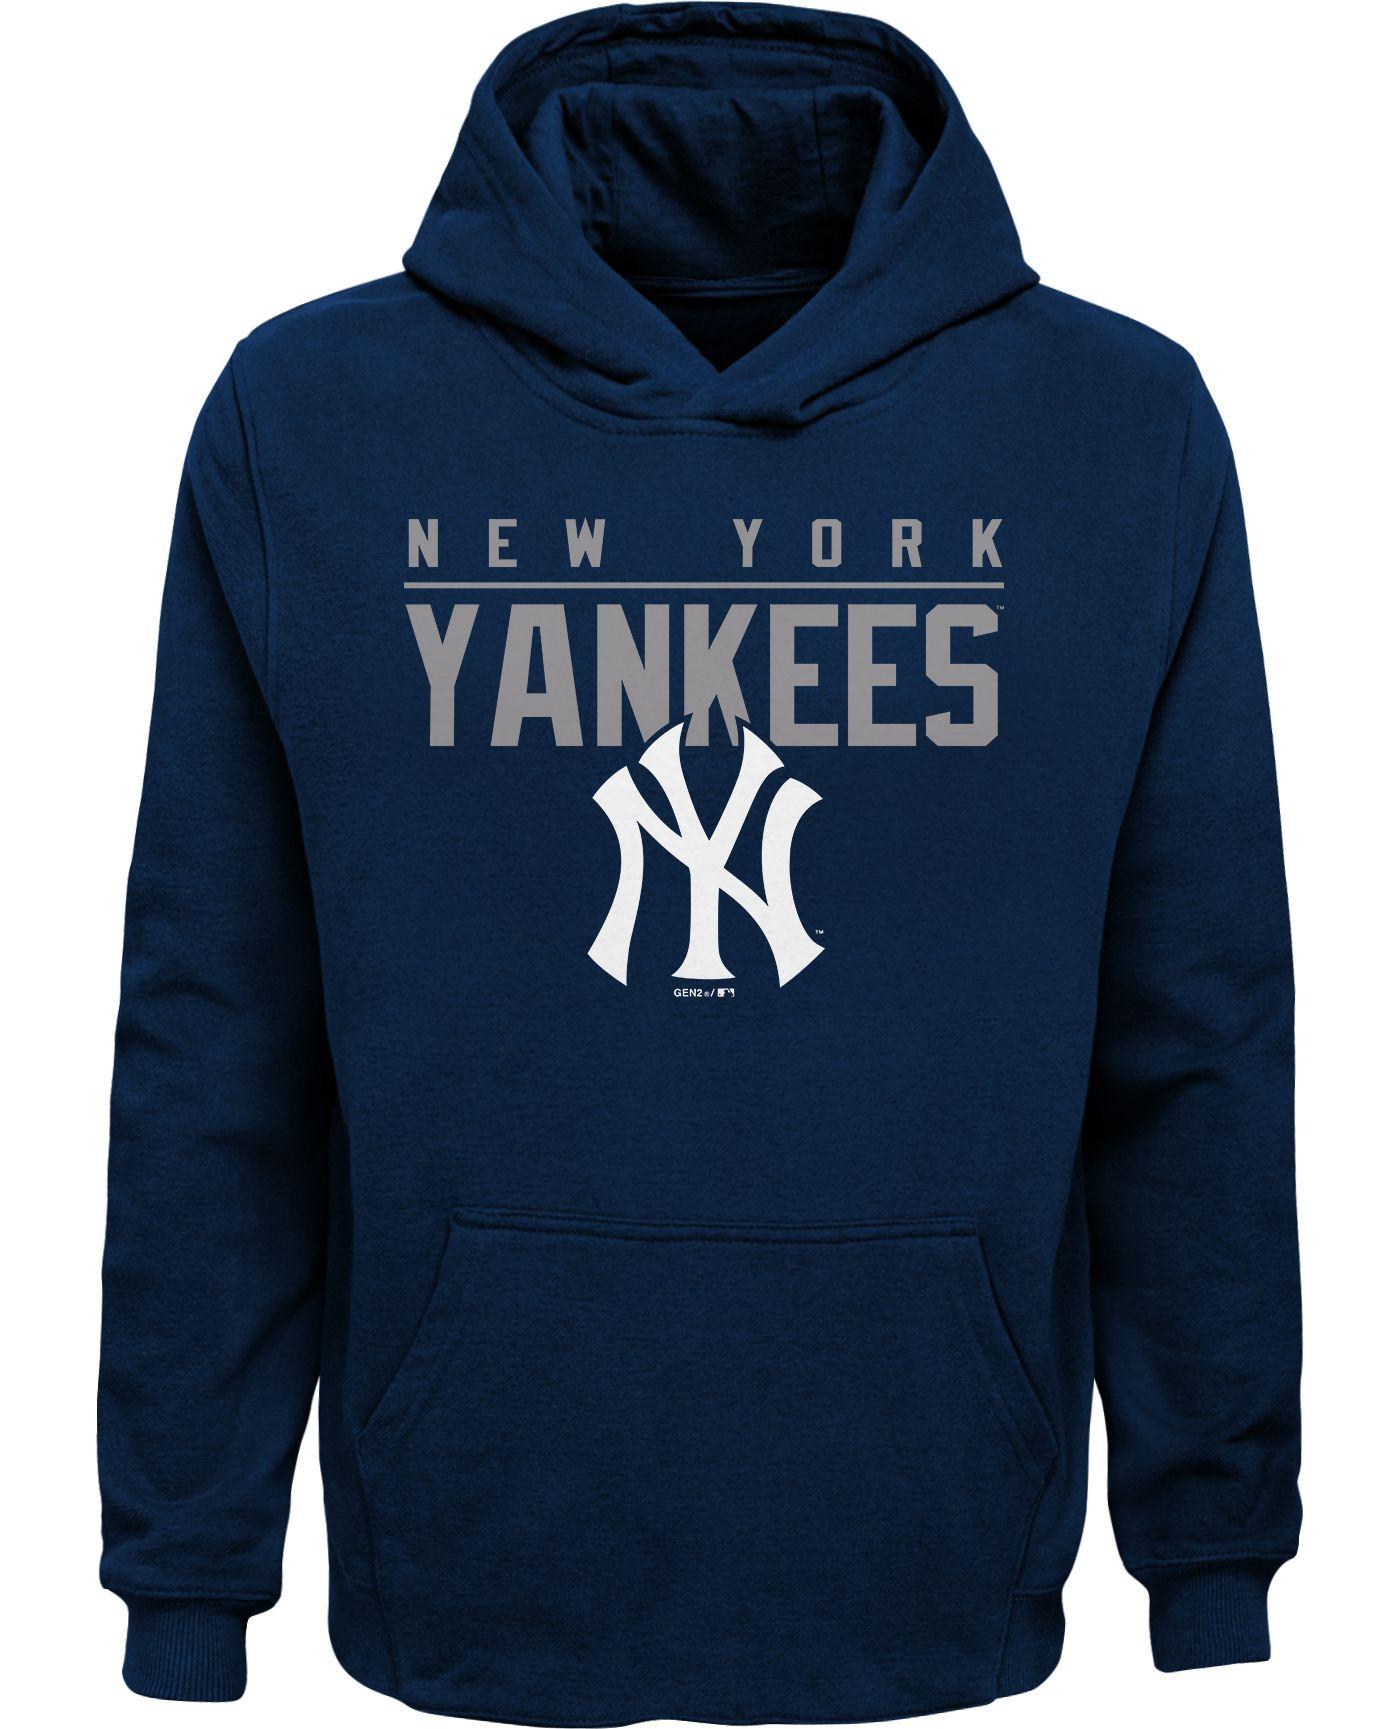 Gen2 Youth New York Yankees Pullover Hoodie